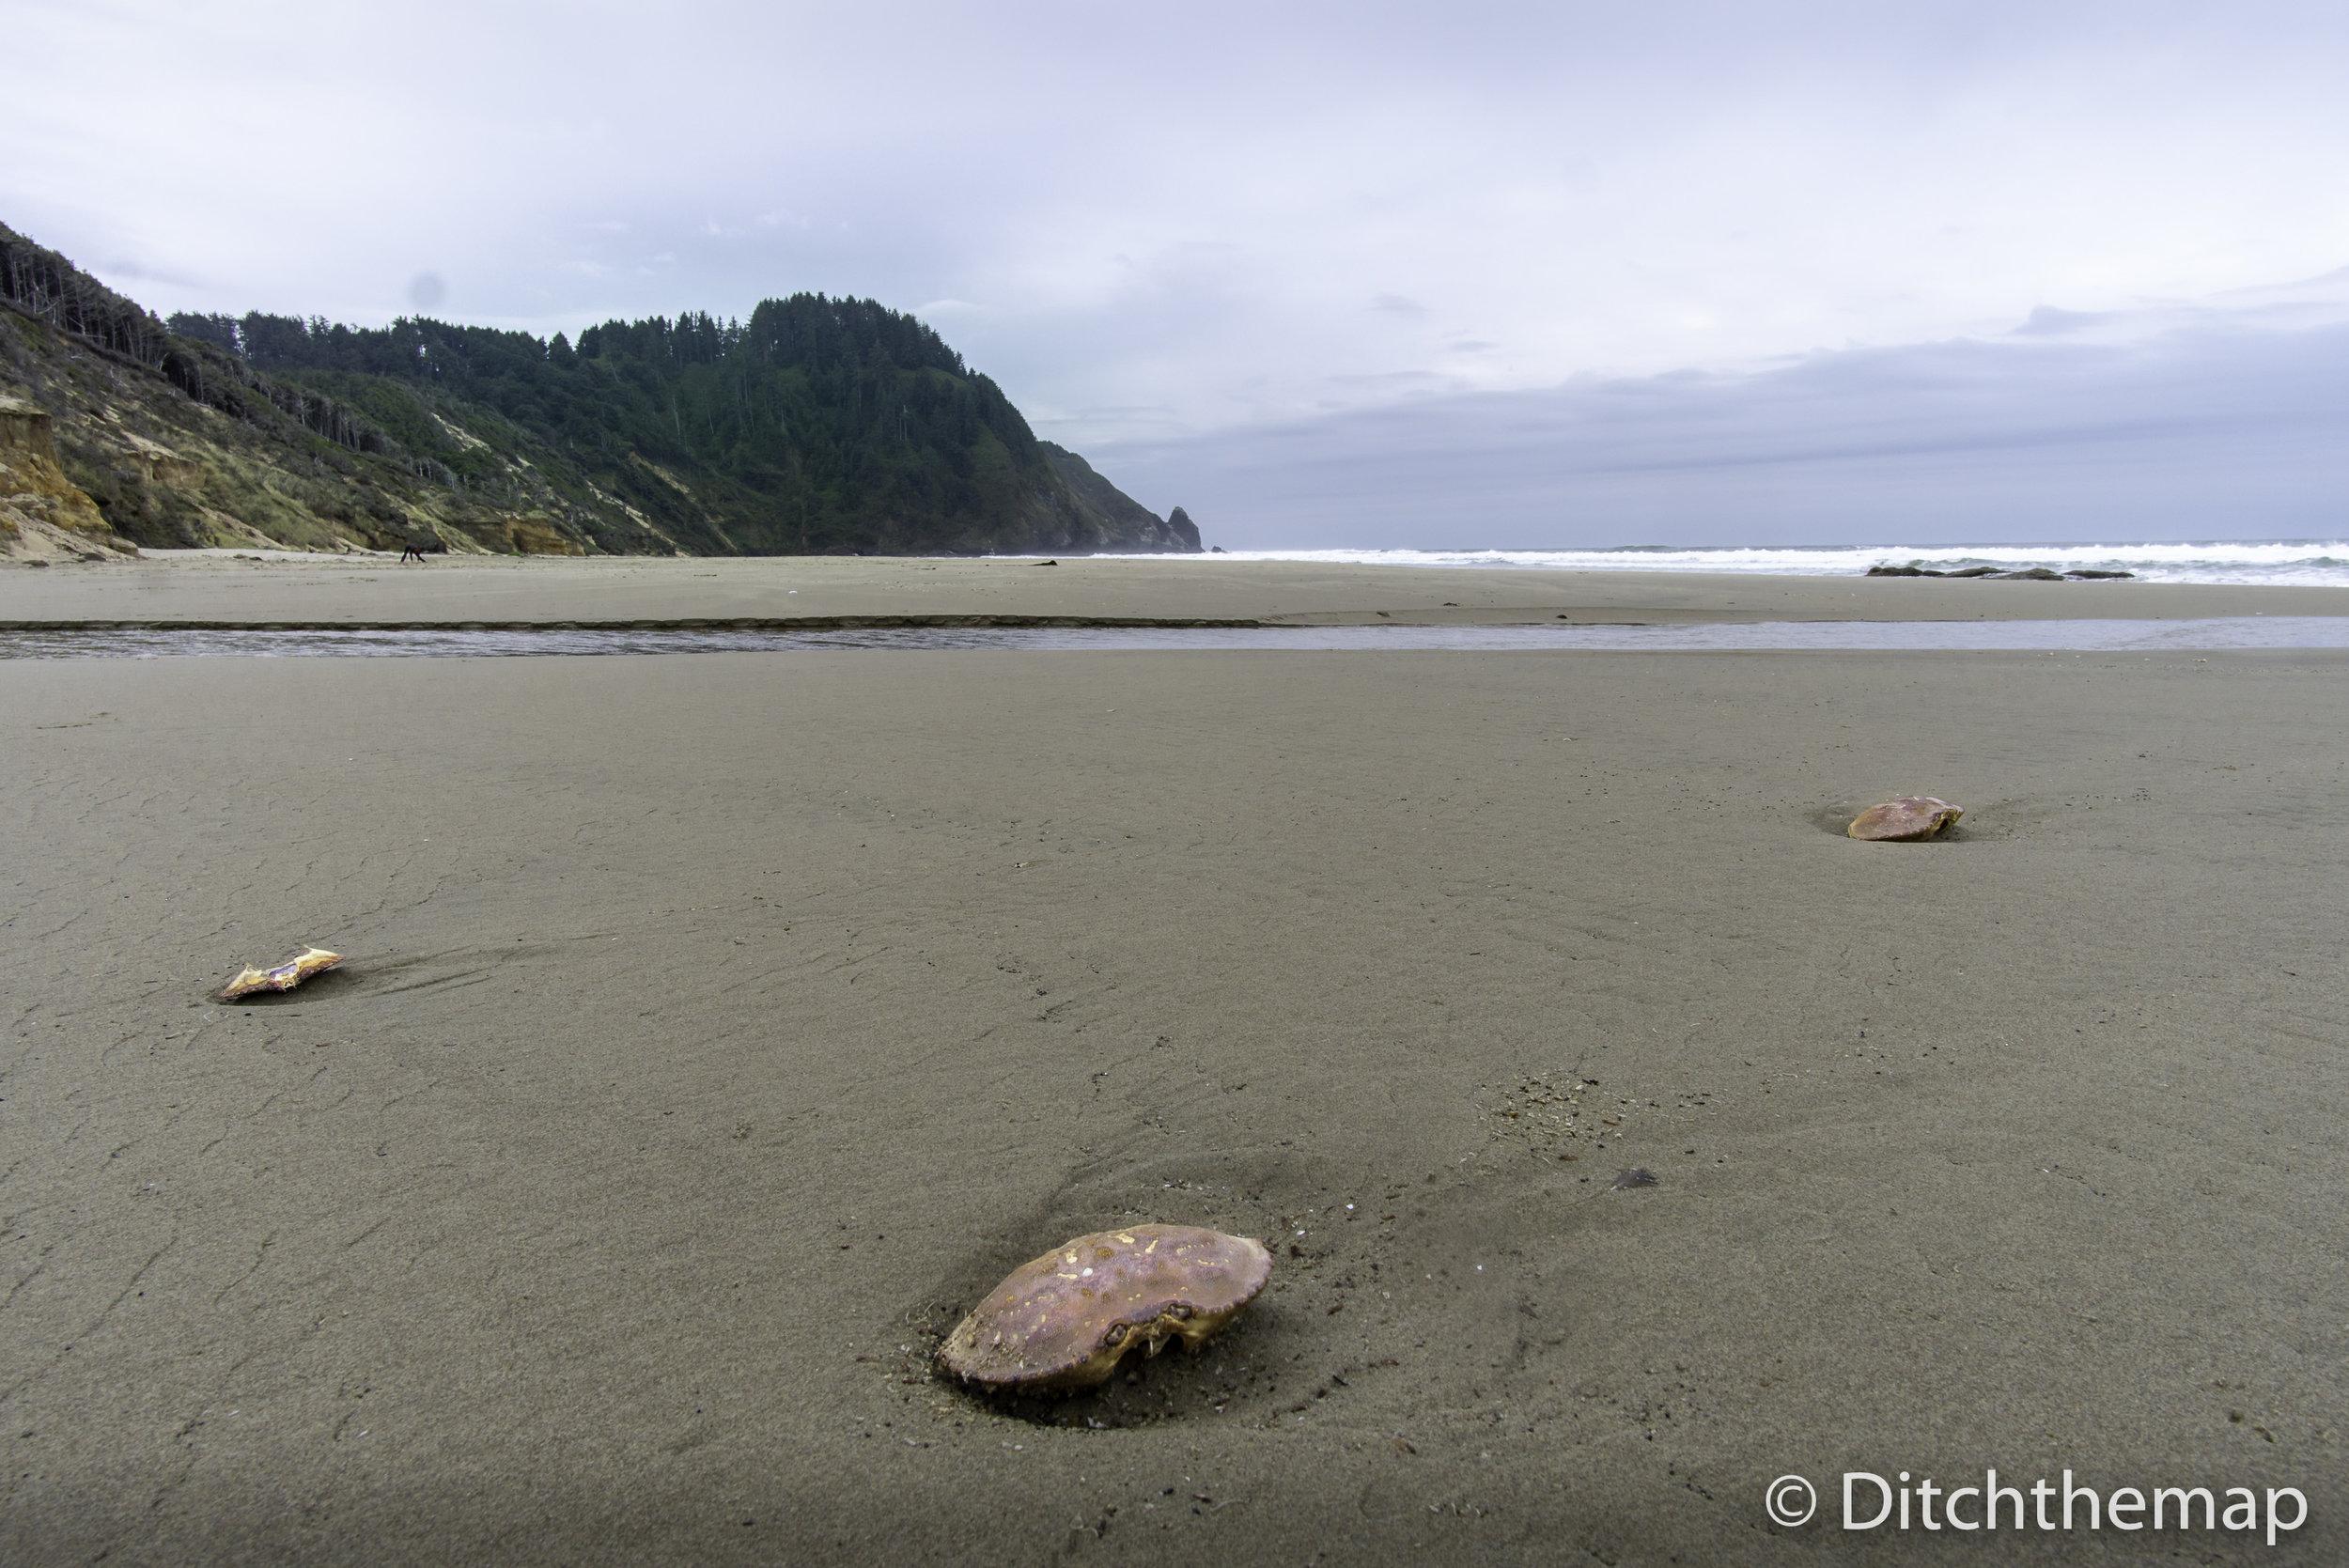 Oregon Coast Beach with crabs on sand